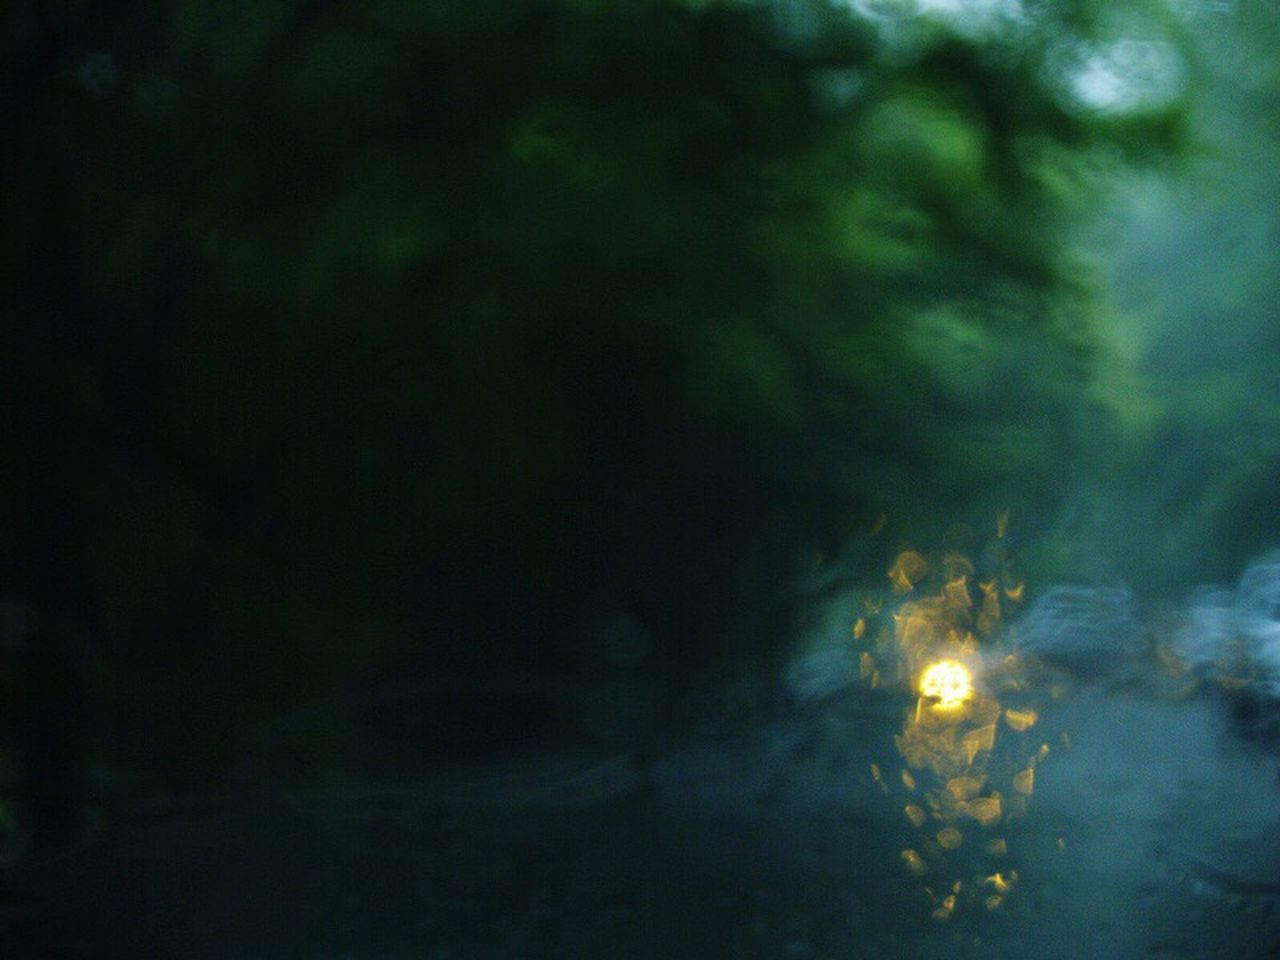 Rain Rainy Days Gloomy Weather Green Light Motion Illuminated Water No People Outdoors EyeEmNewHere